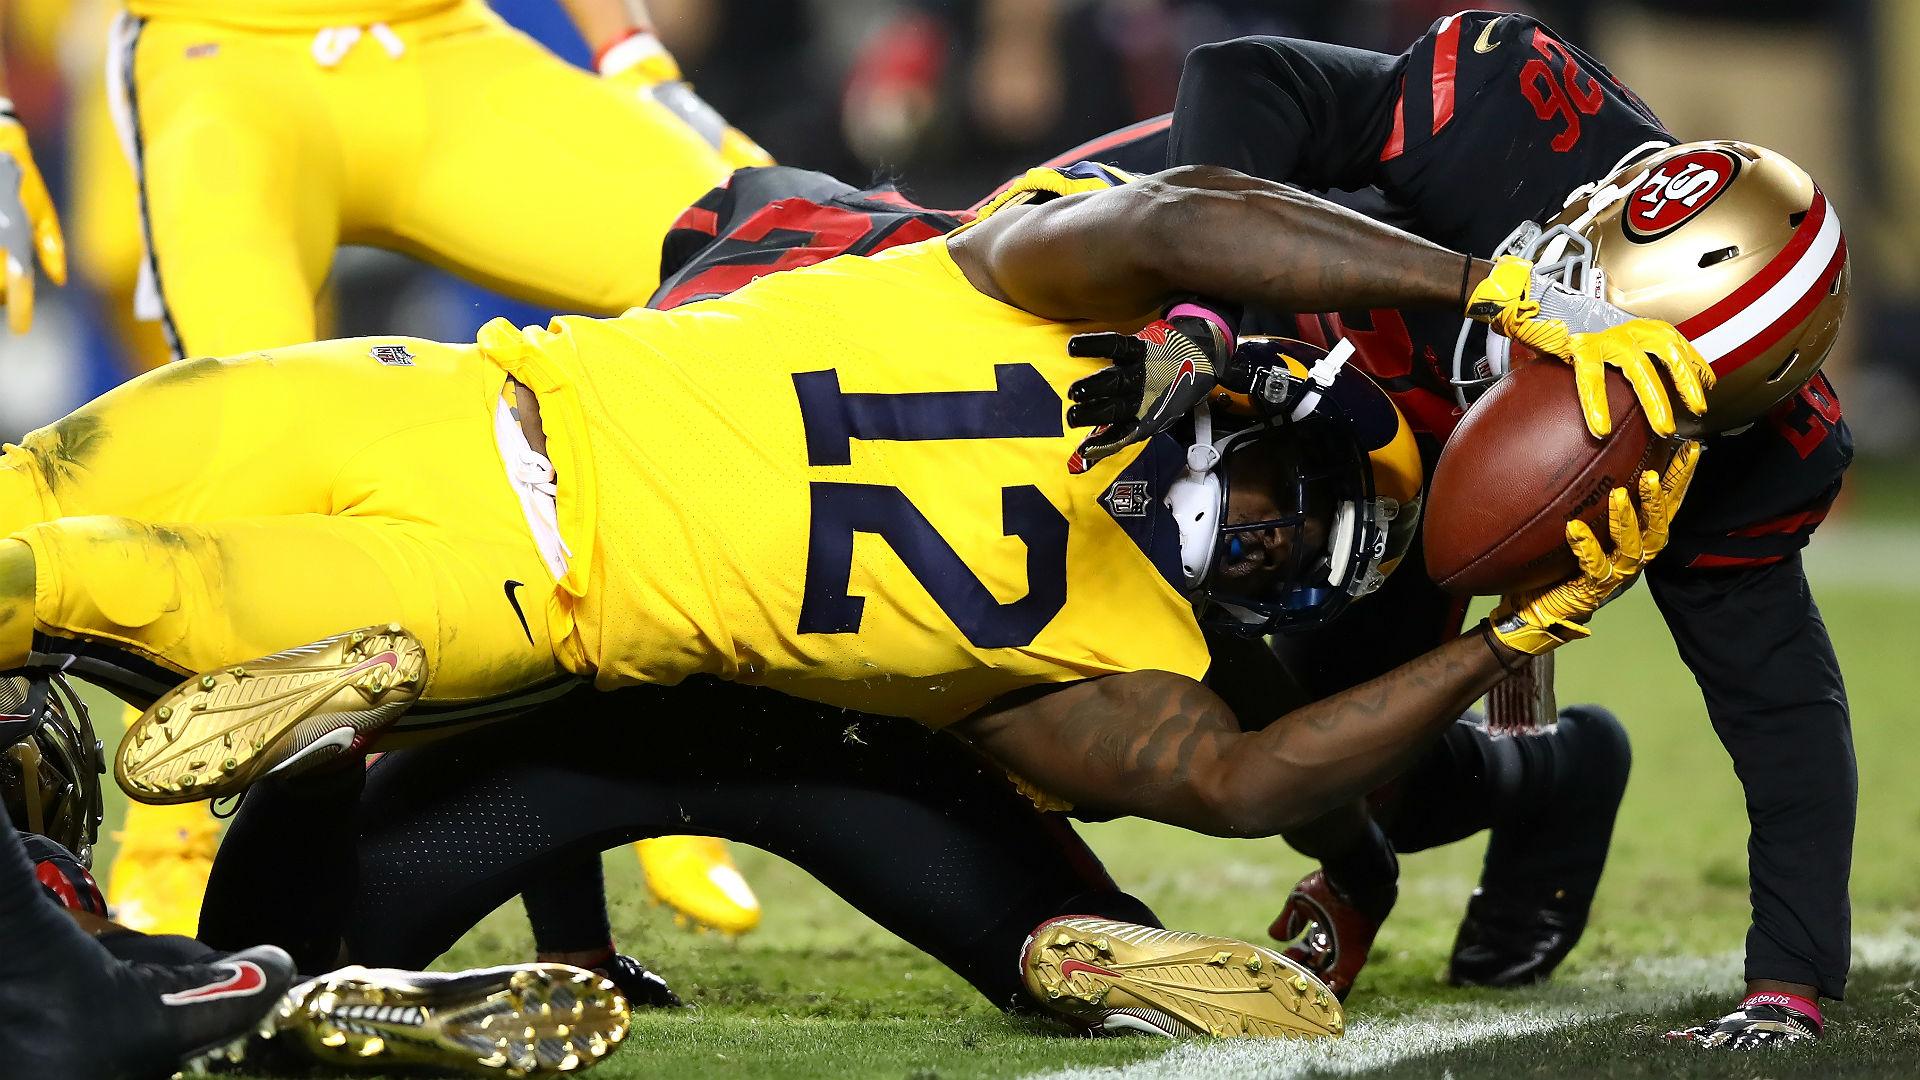 Rams WRs Sammy Watkins, Tavon Austin in concussion protocol after win vs. 49ers